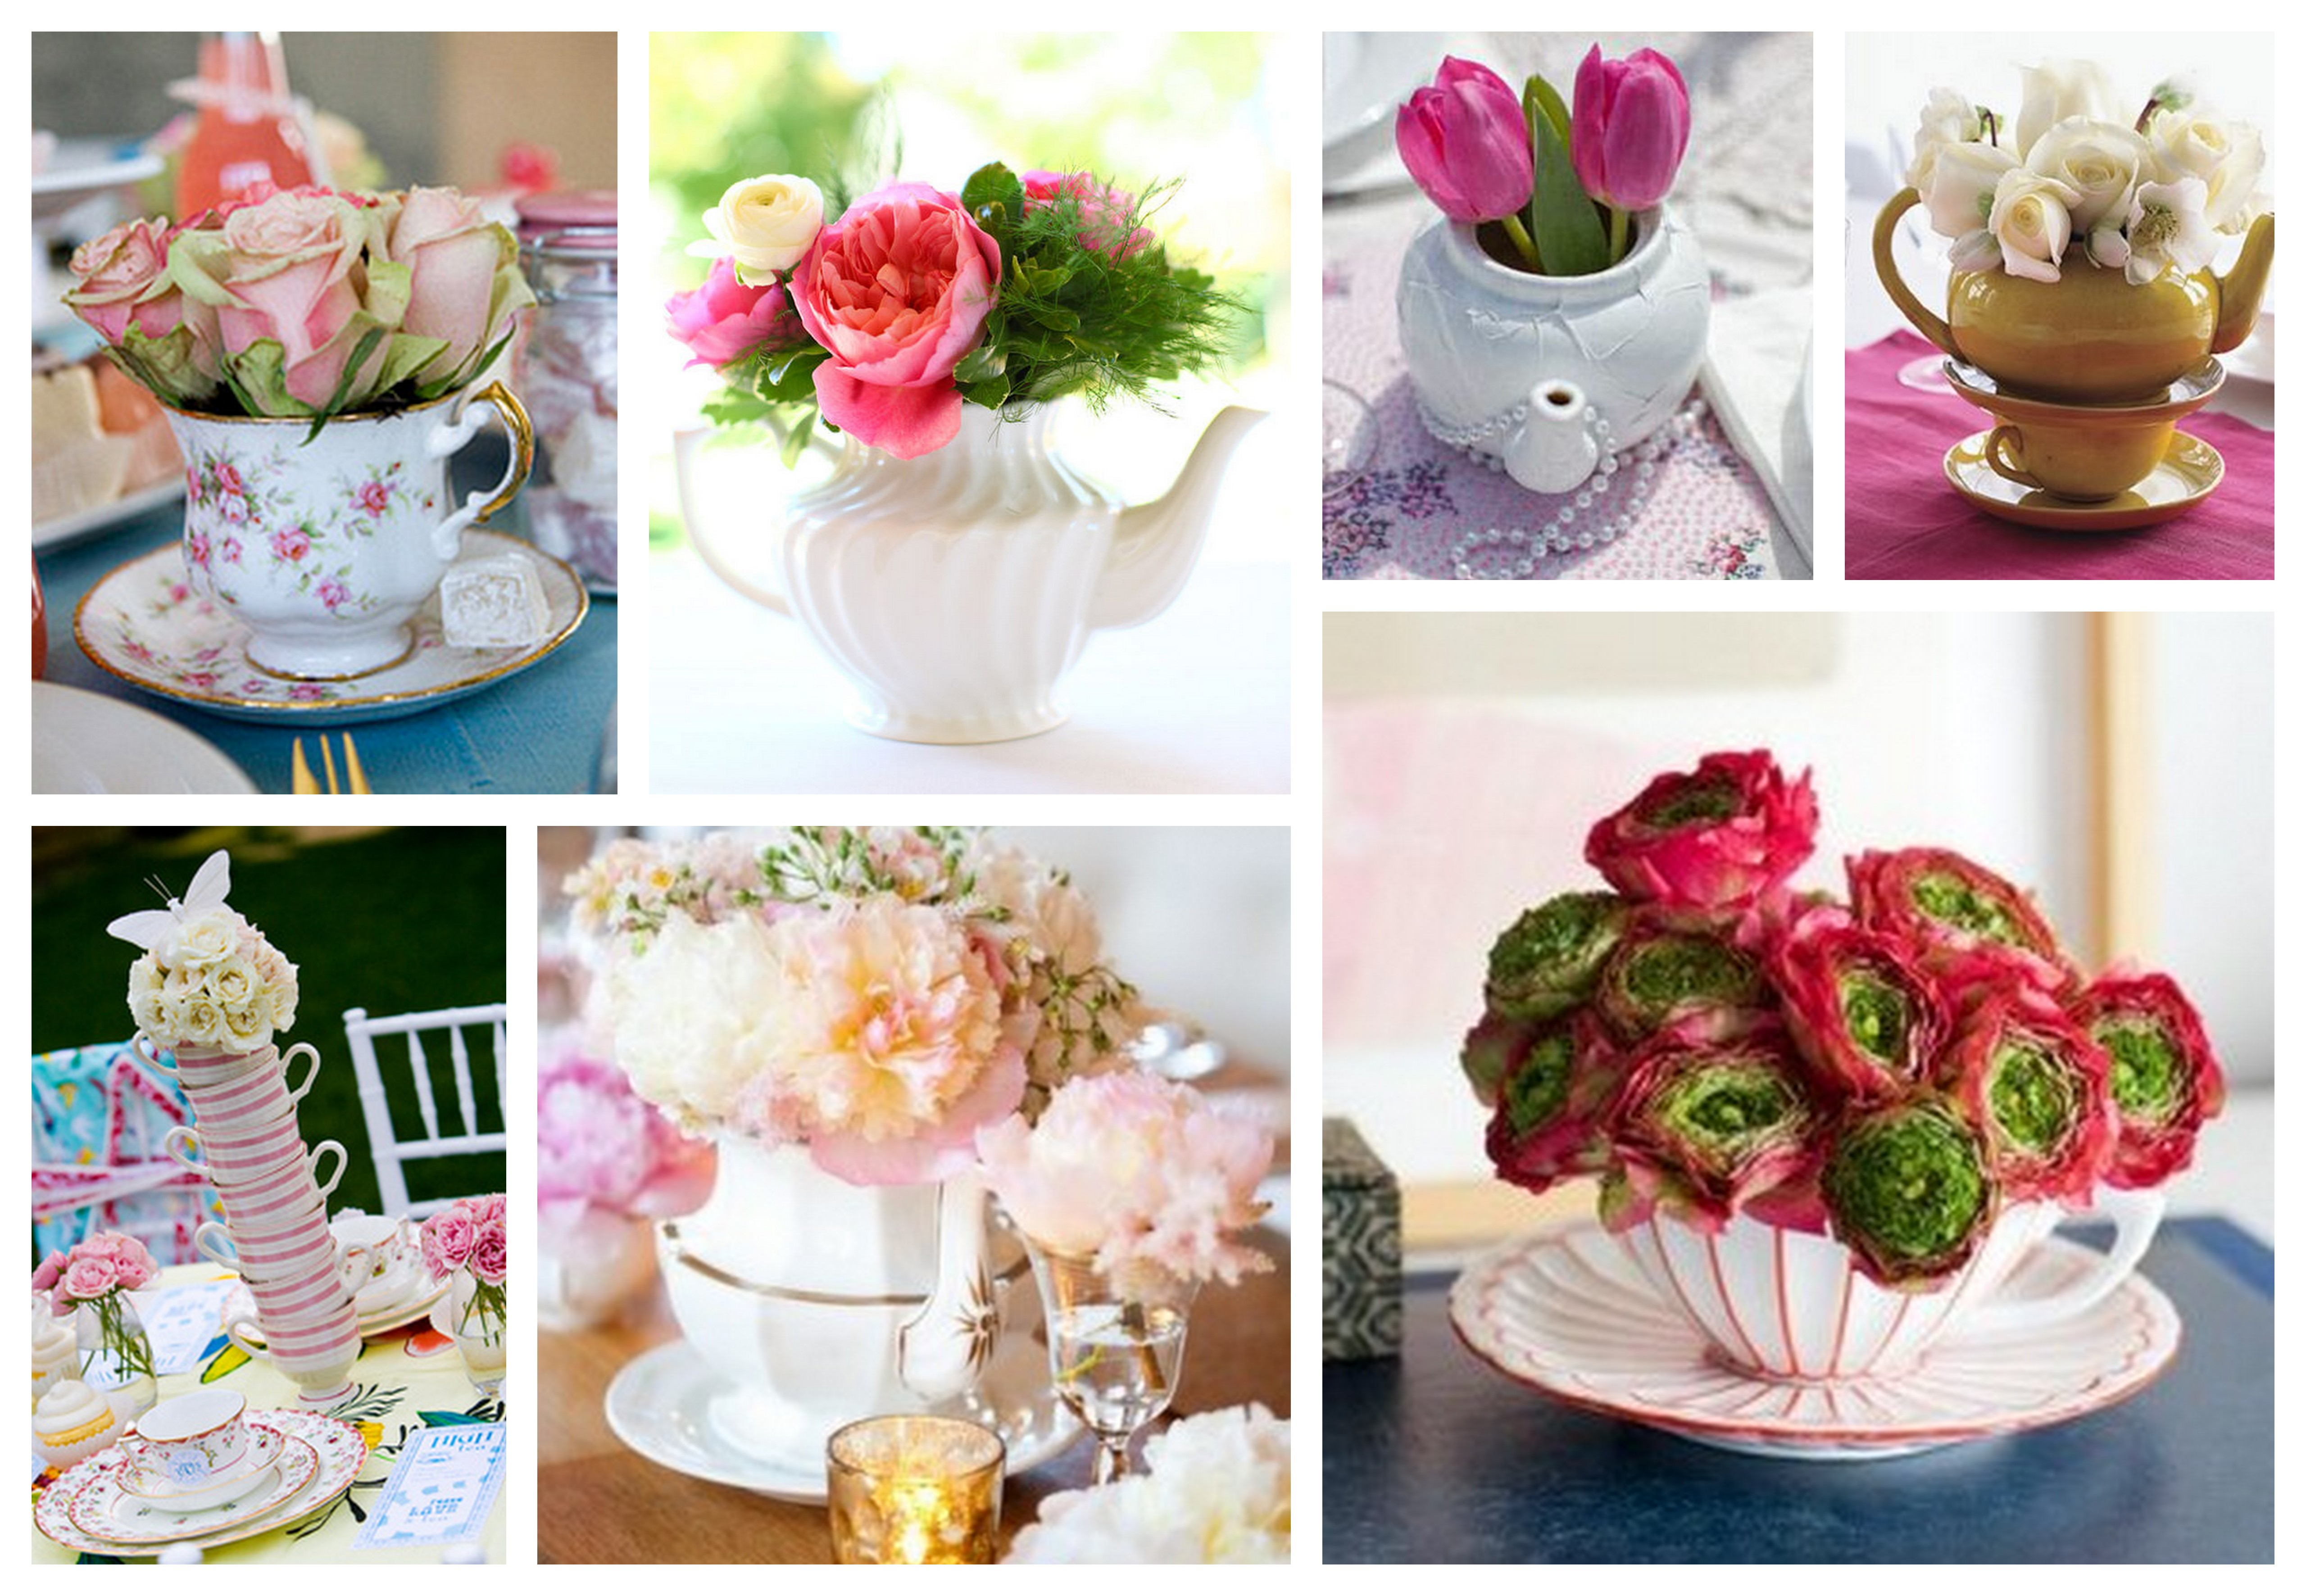 Rp Tea Party Wedding Theme Centrepieces